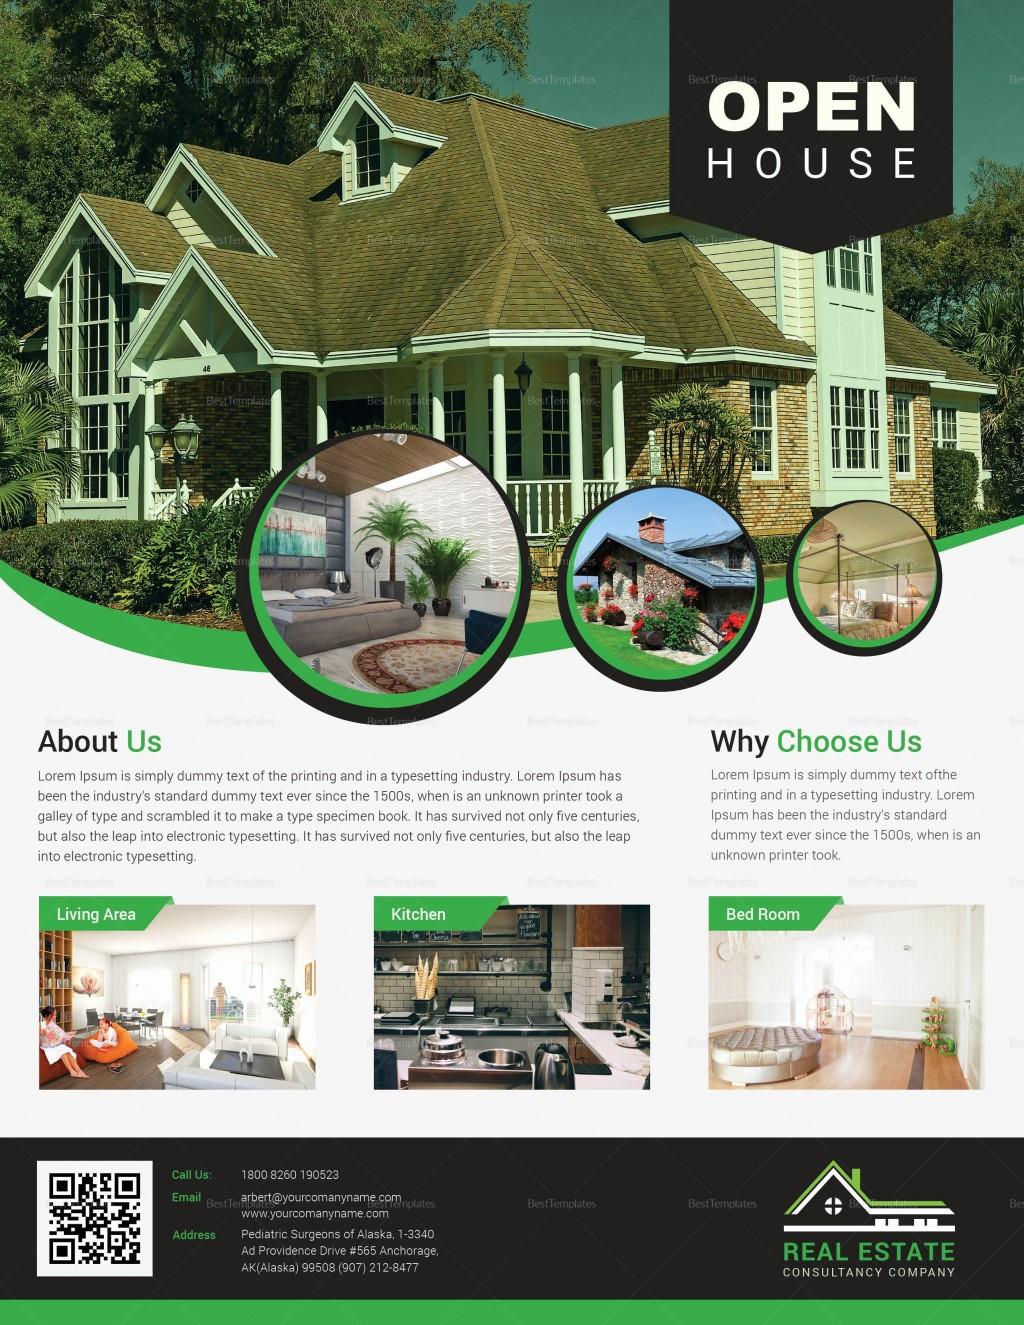 000 Astounding Open House Flyer Template Free Picture  School Microsoft Word PreschoolLarge